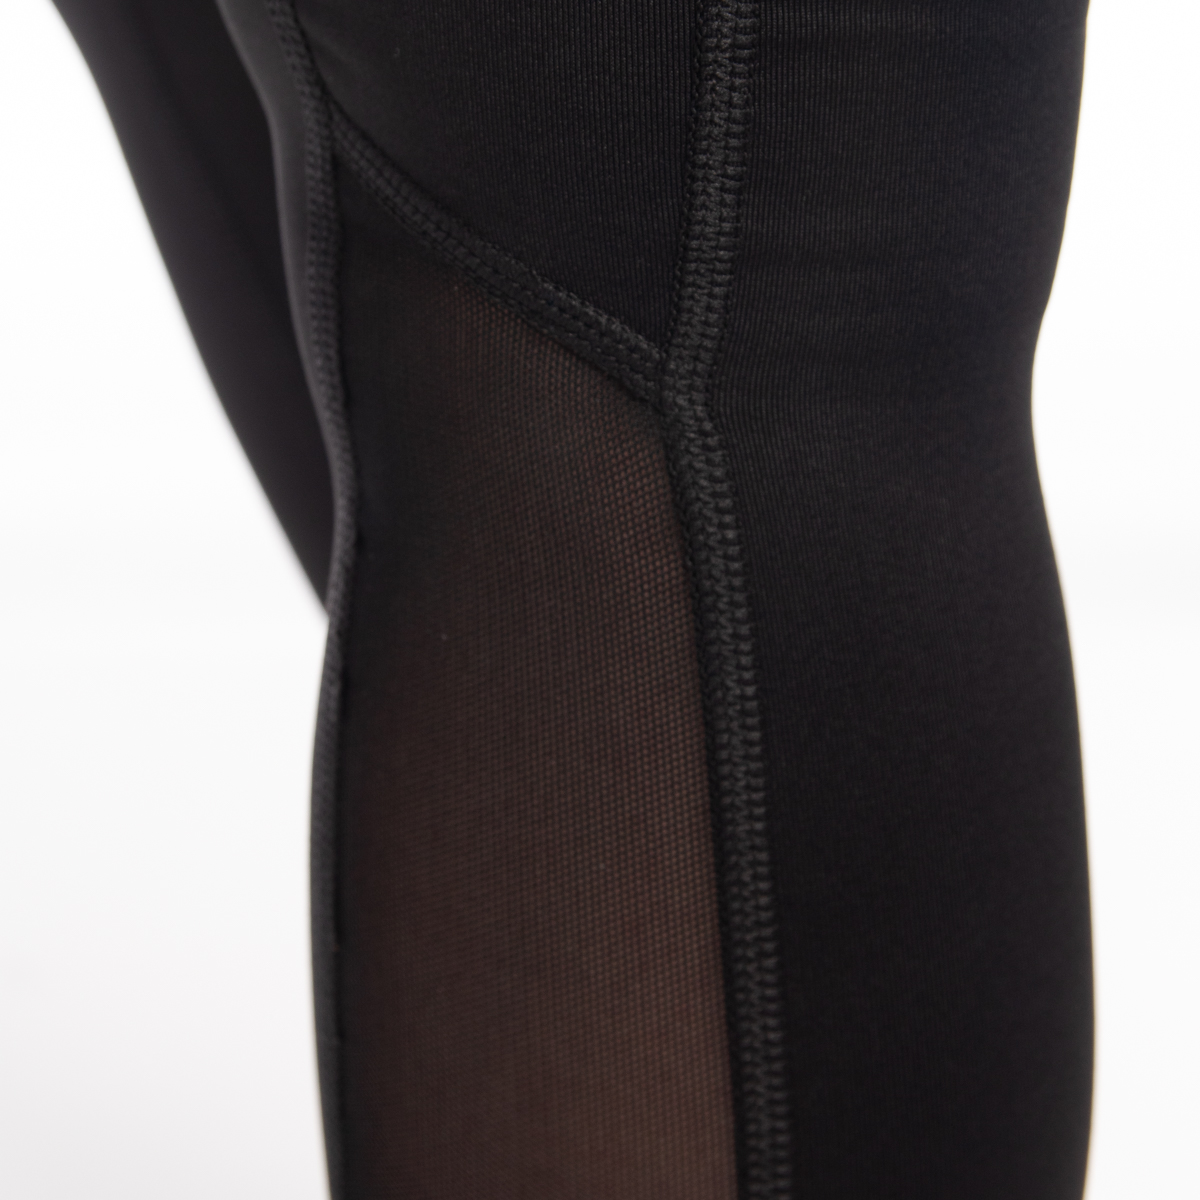 7-8-Length-High-Waist-Moisture-Wicking-UPF-50-Leggings-Run-Gym-Yoga-Pants-Mesh thumbnail 5